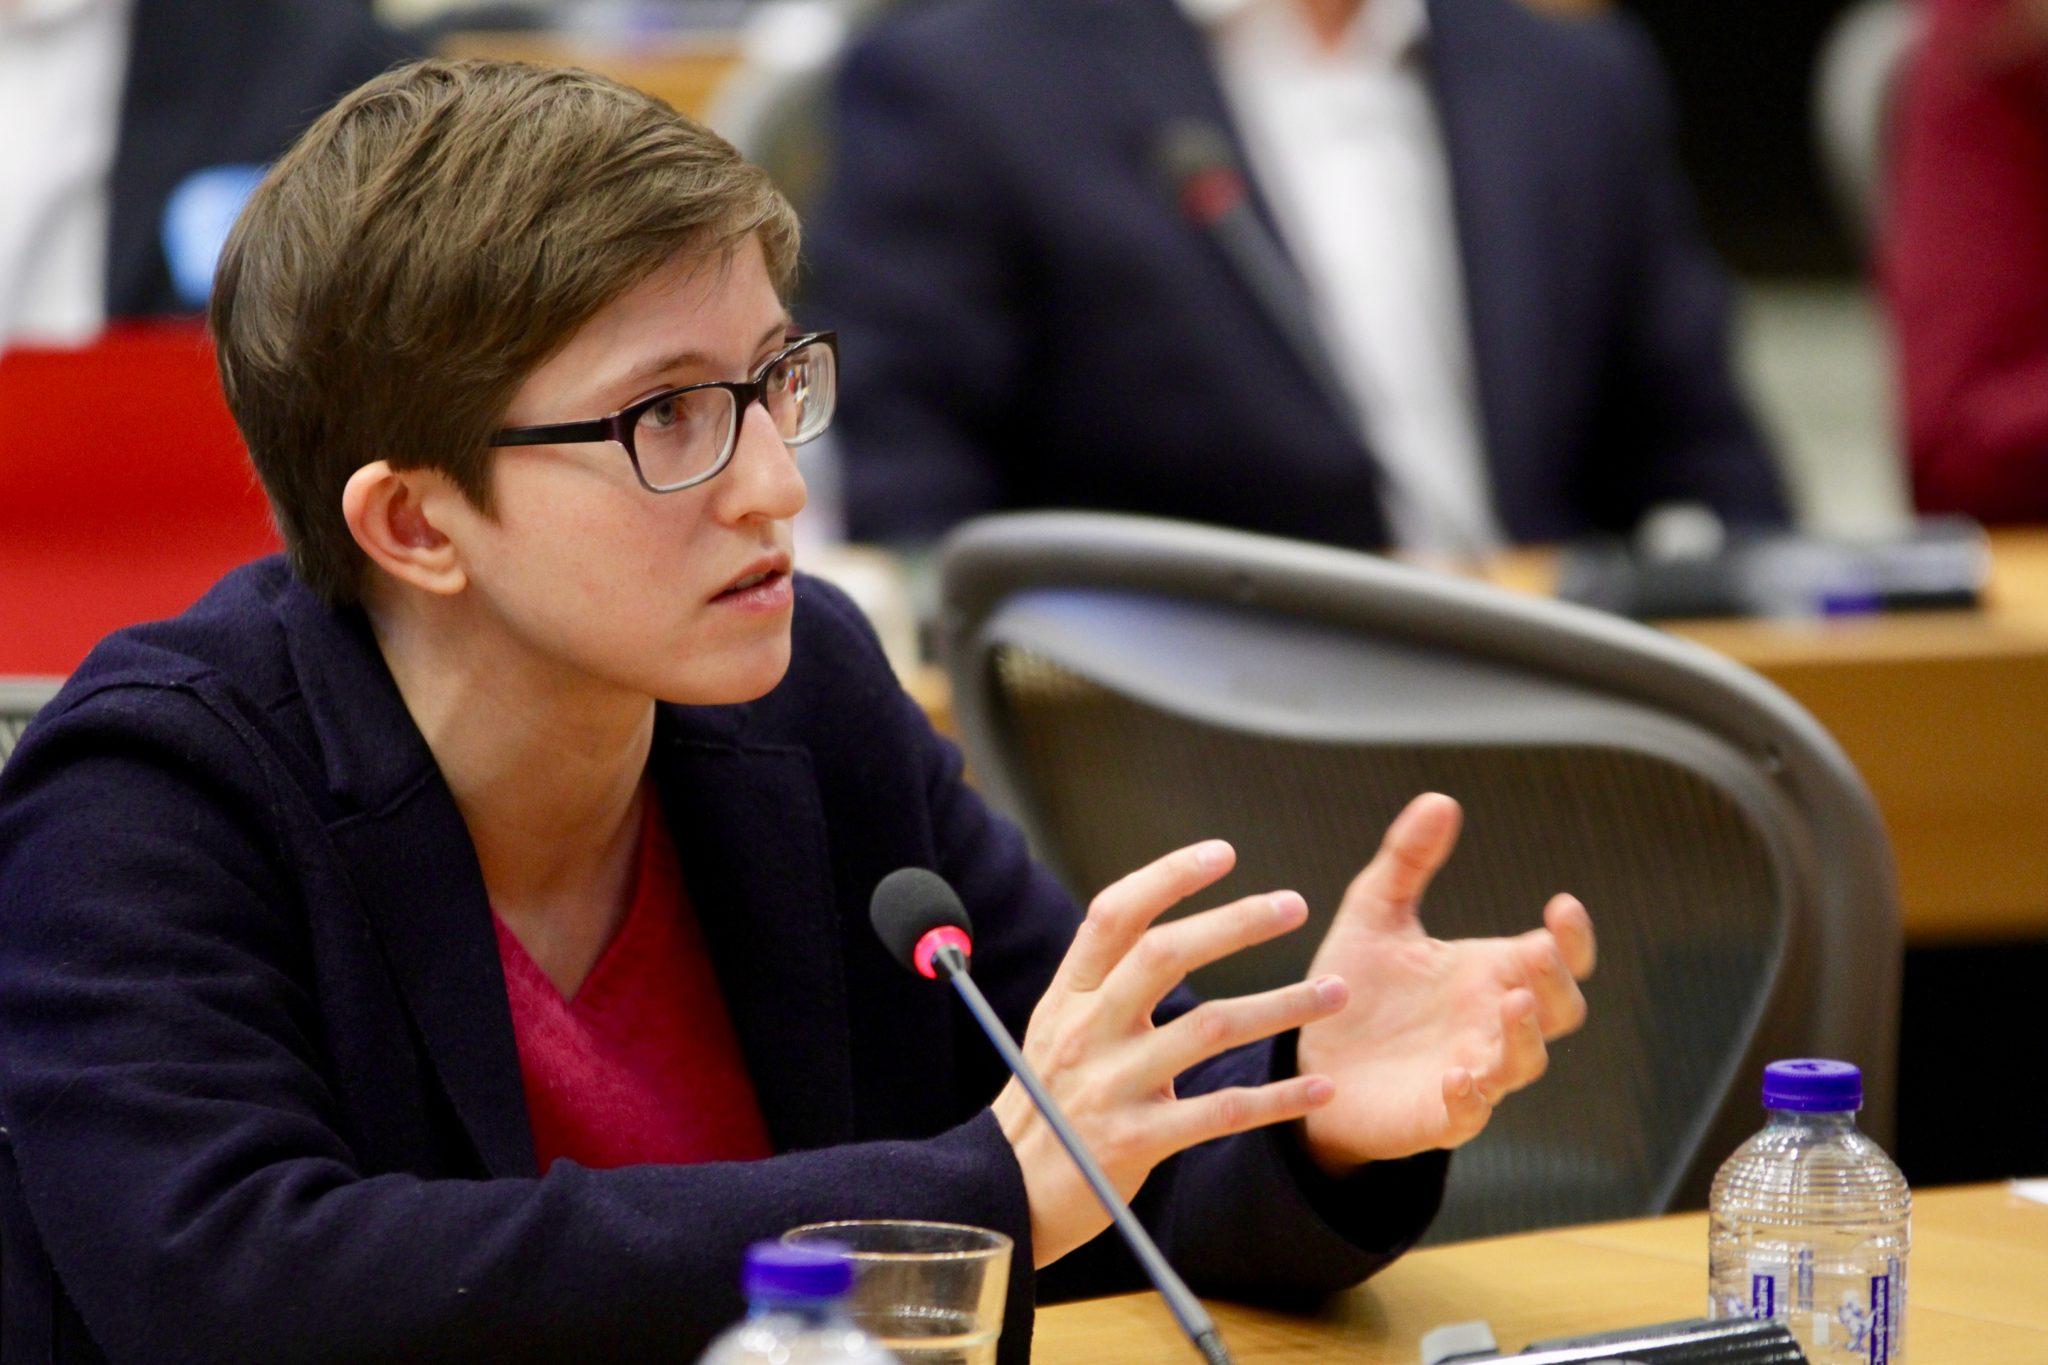 Julia Redaová (juliareda.eu)